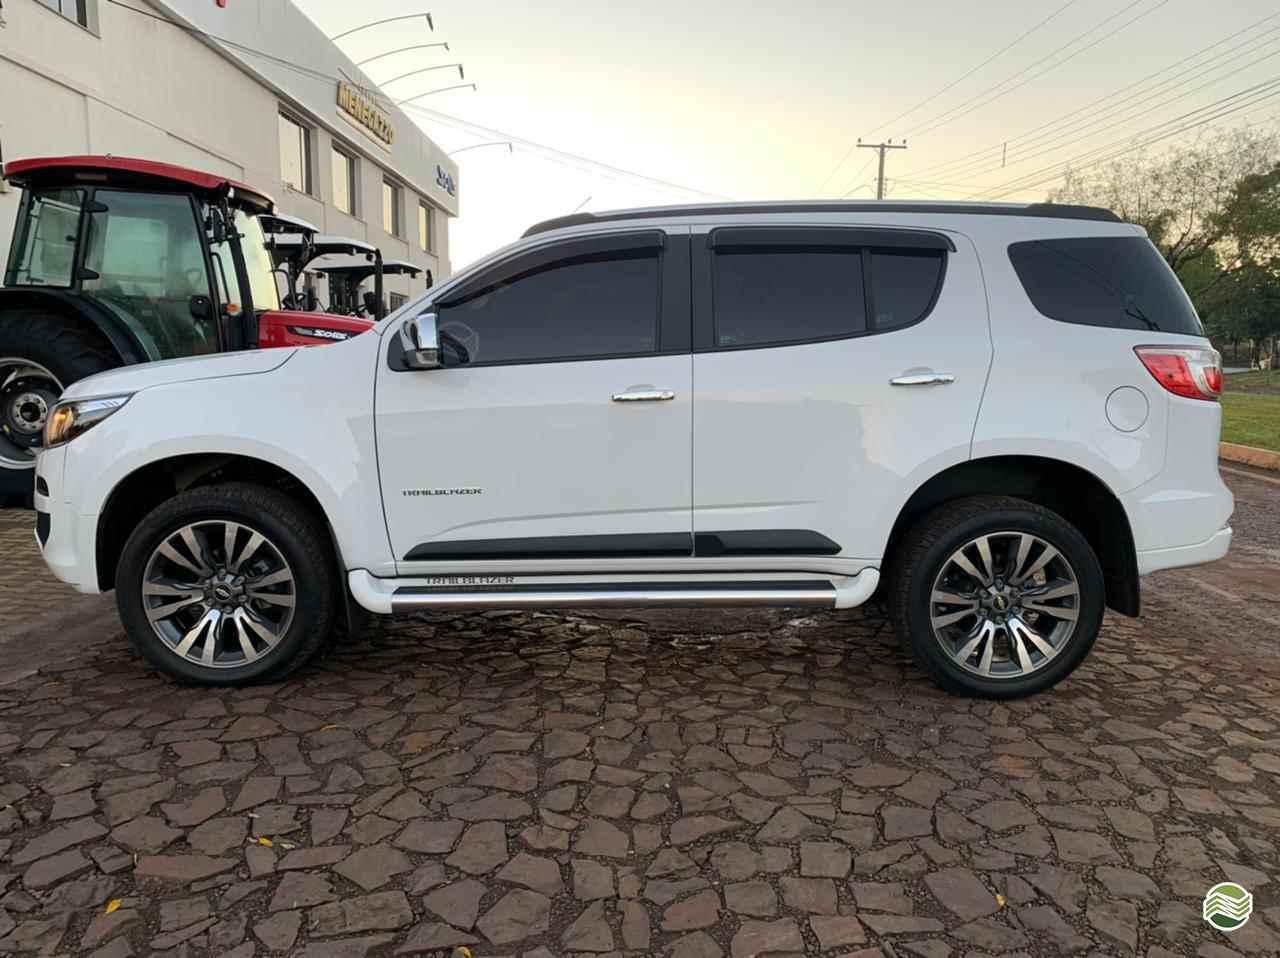 CARRO GM - Chevrolet Trailblazer 2.8 LT Menegazzo - Yanmar Stara CONSTANTINA RIO GRANDE DO SUL RS